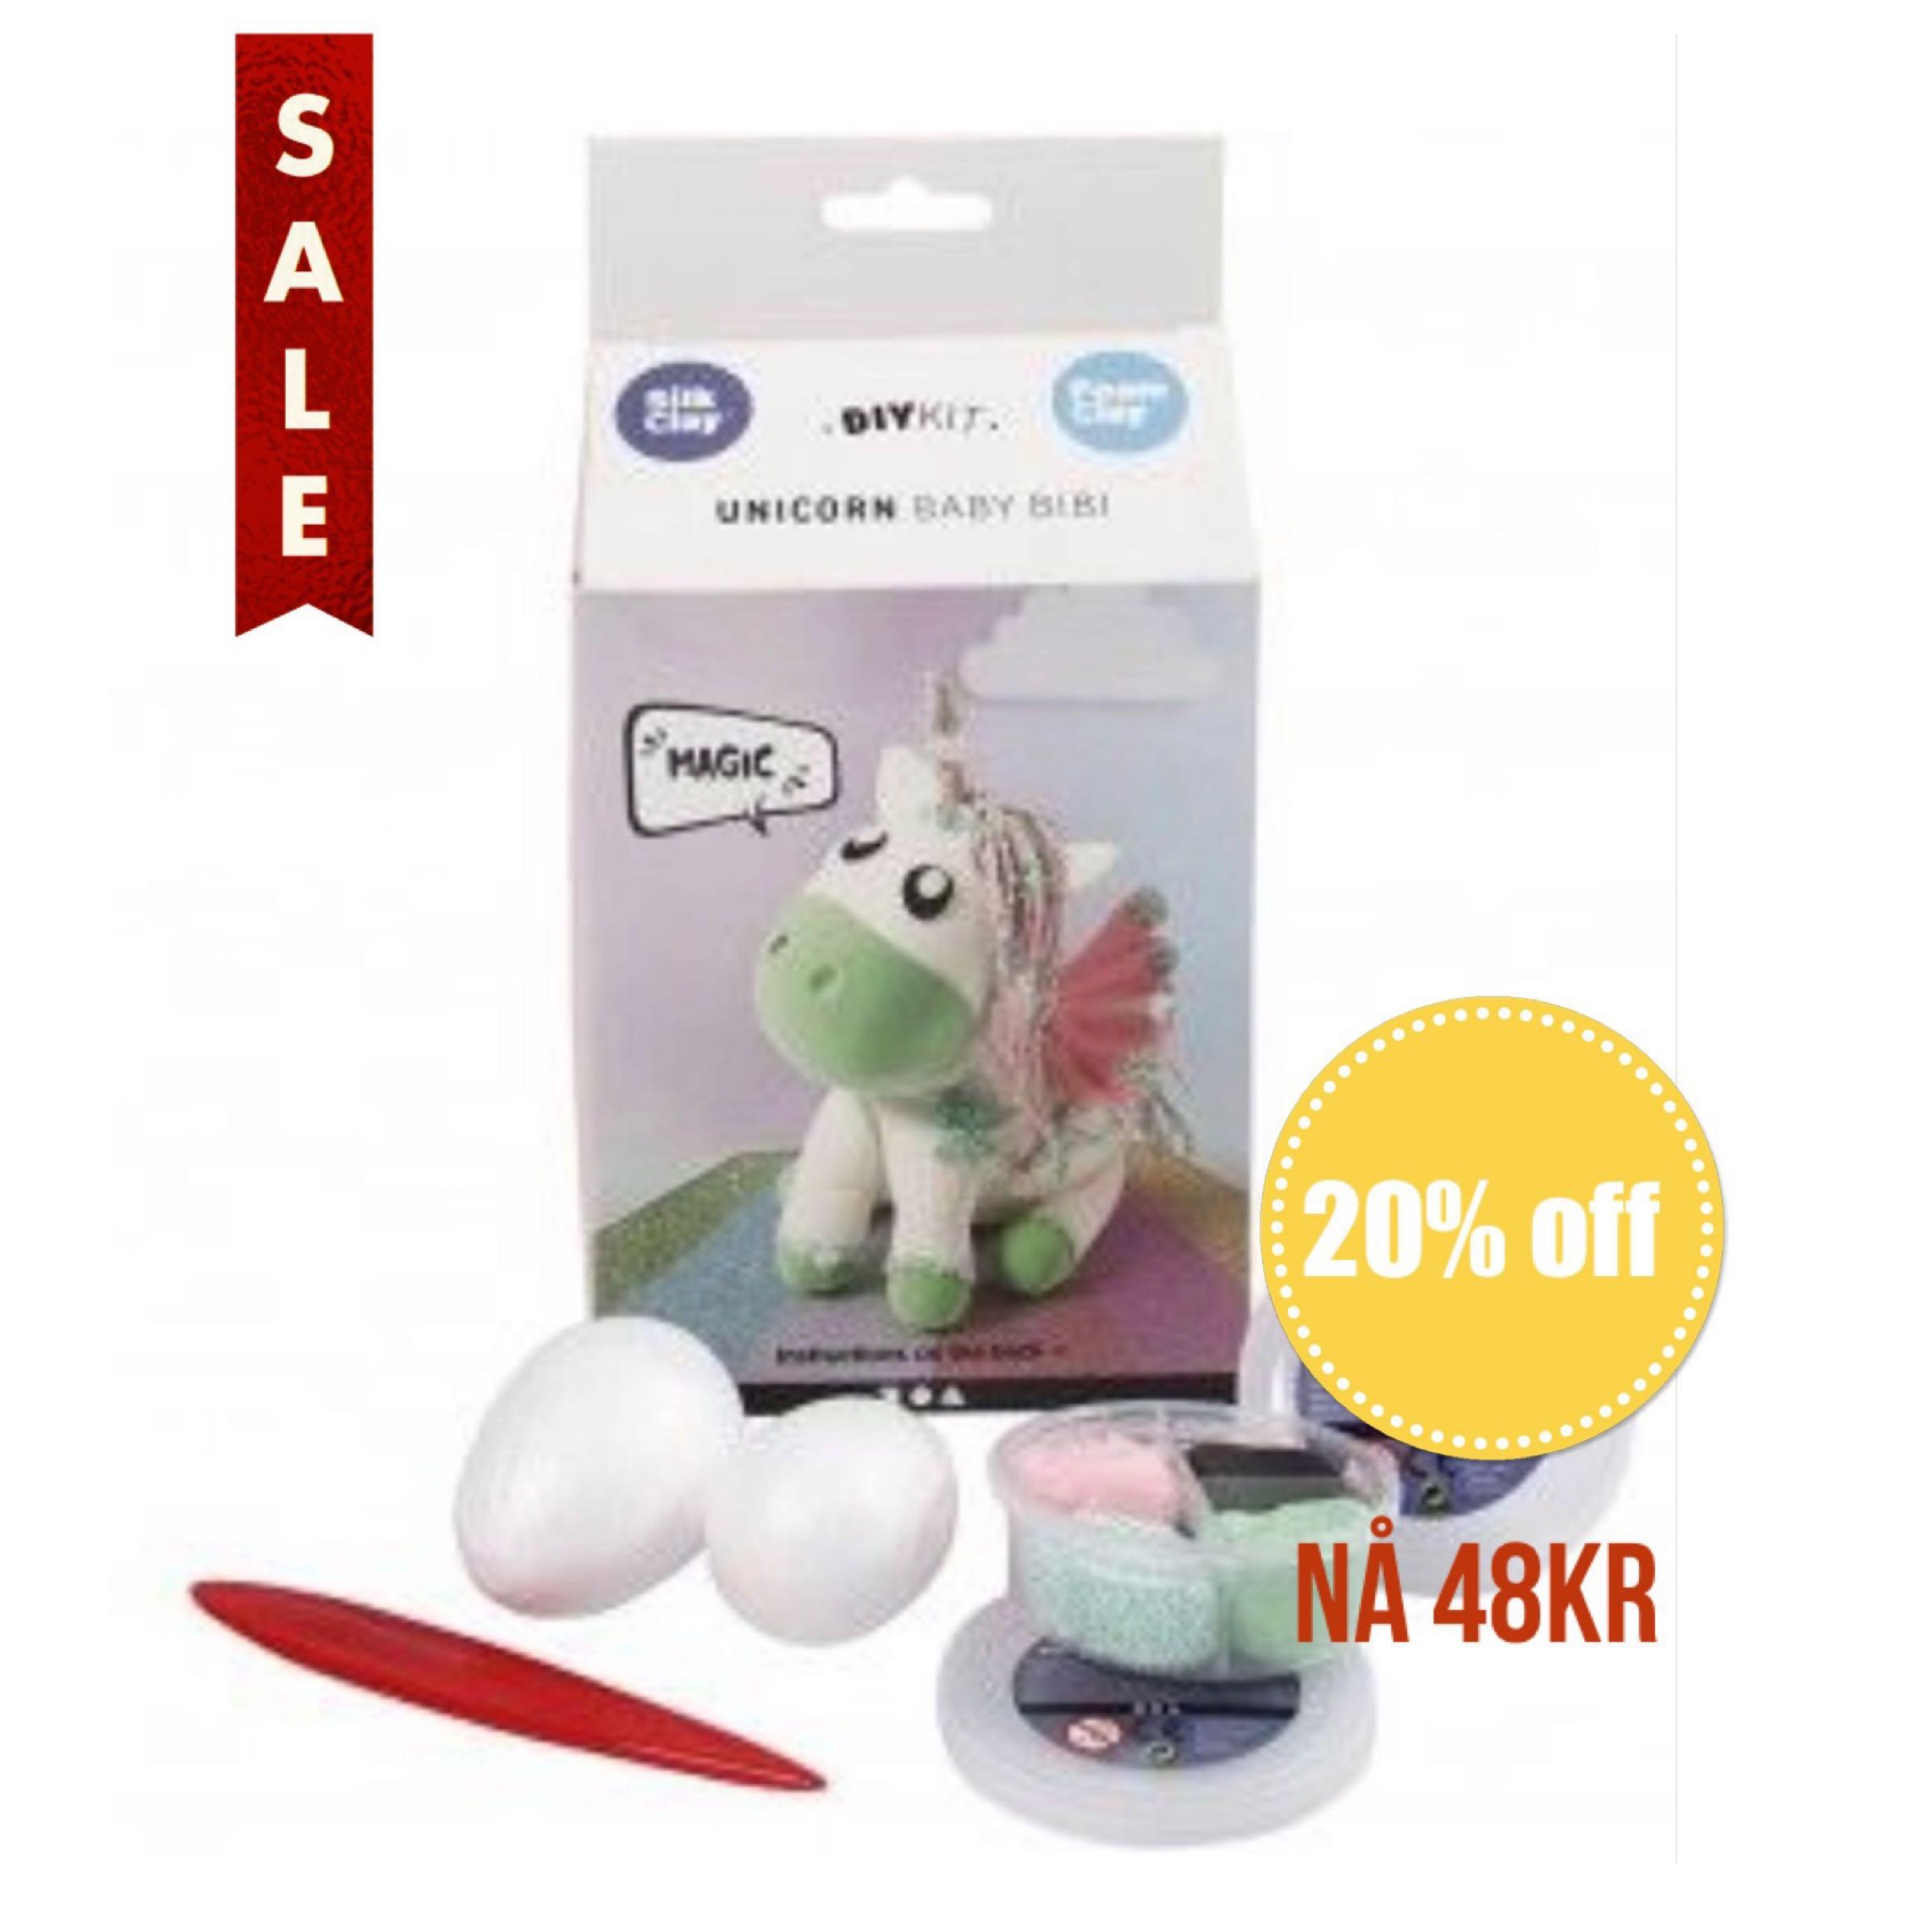 Foam Clay Unicorn Baby Bibi DIY Kit